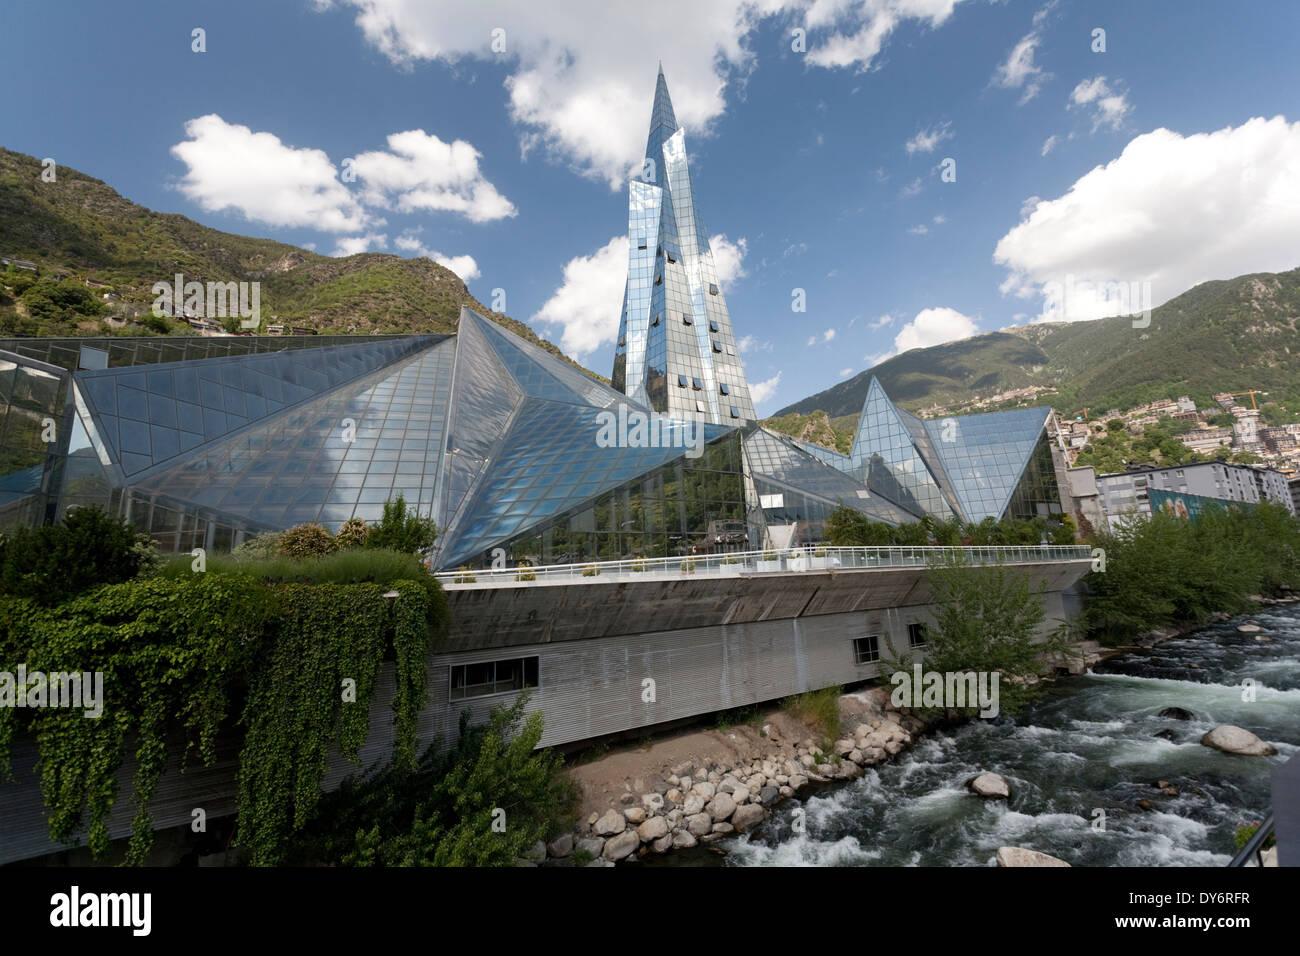 The glass covered spa Caldea and the River Valira in the country of Andorra la Vella - Stock Image